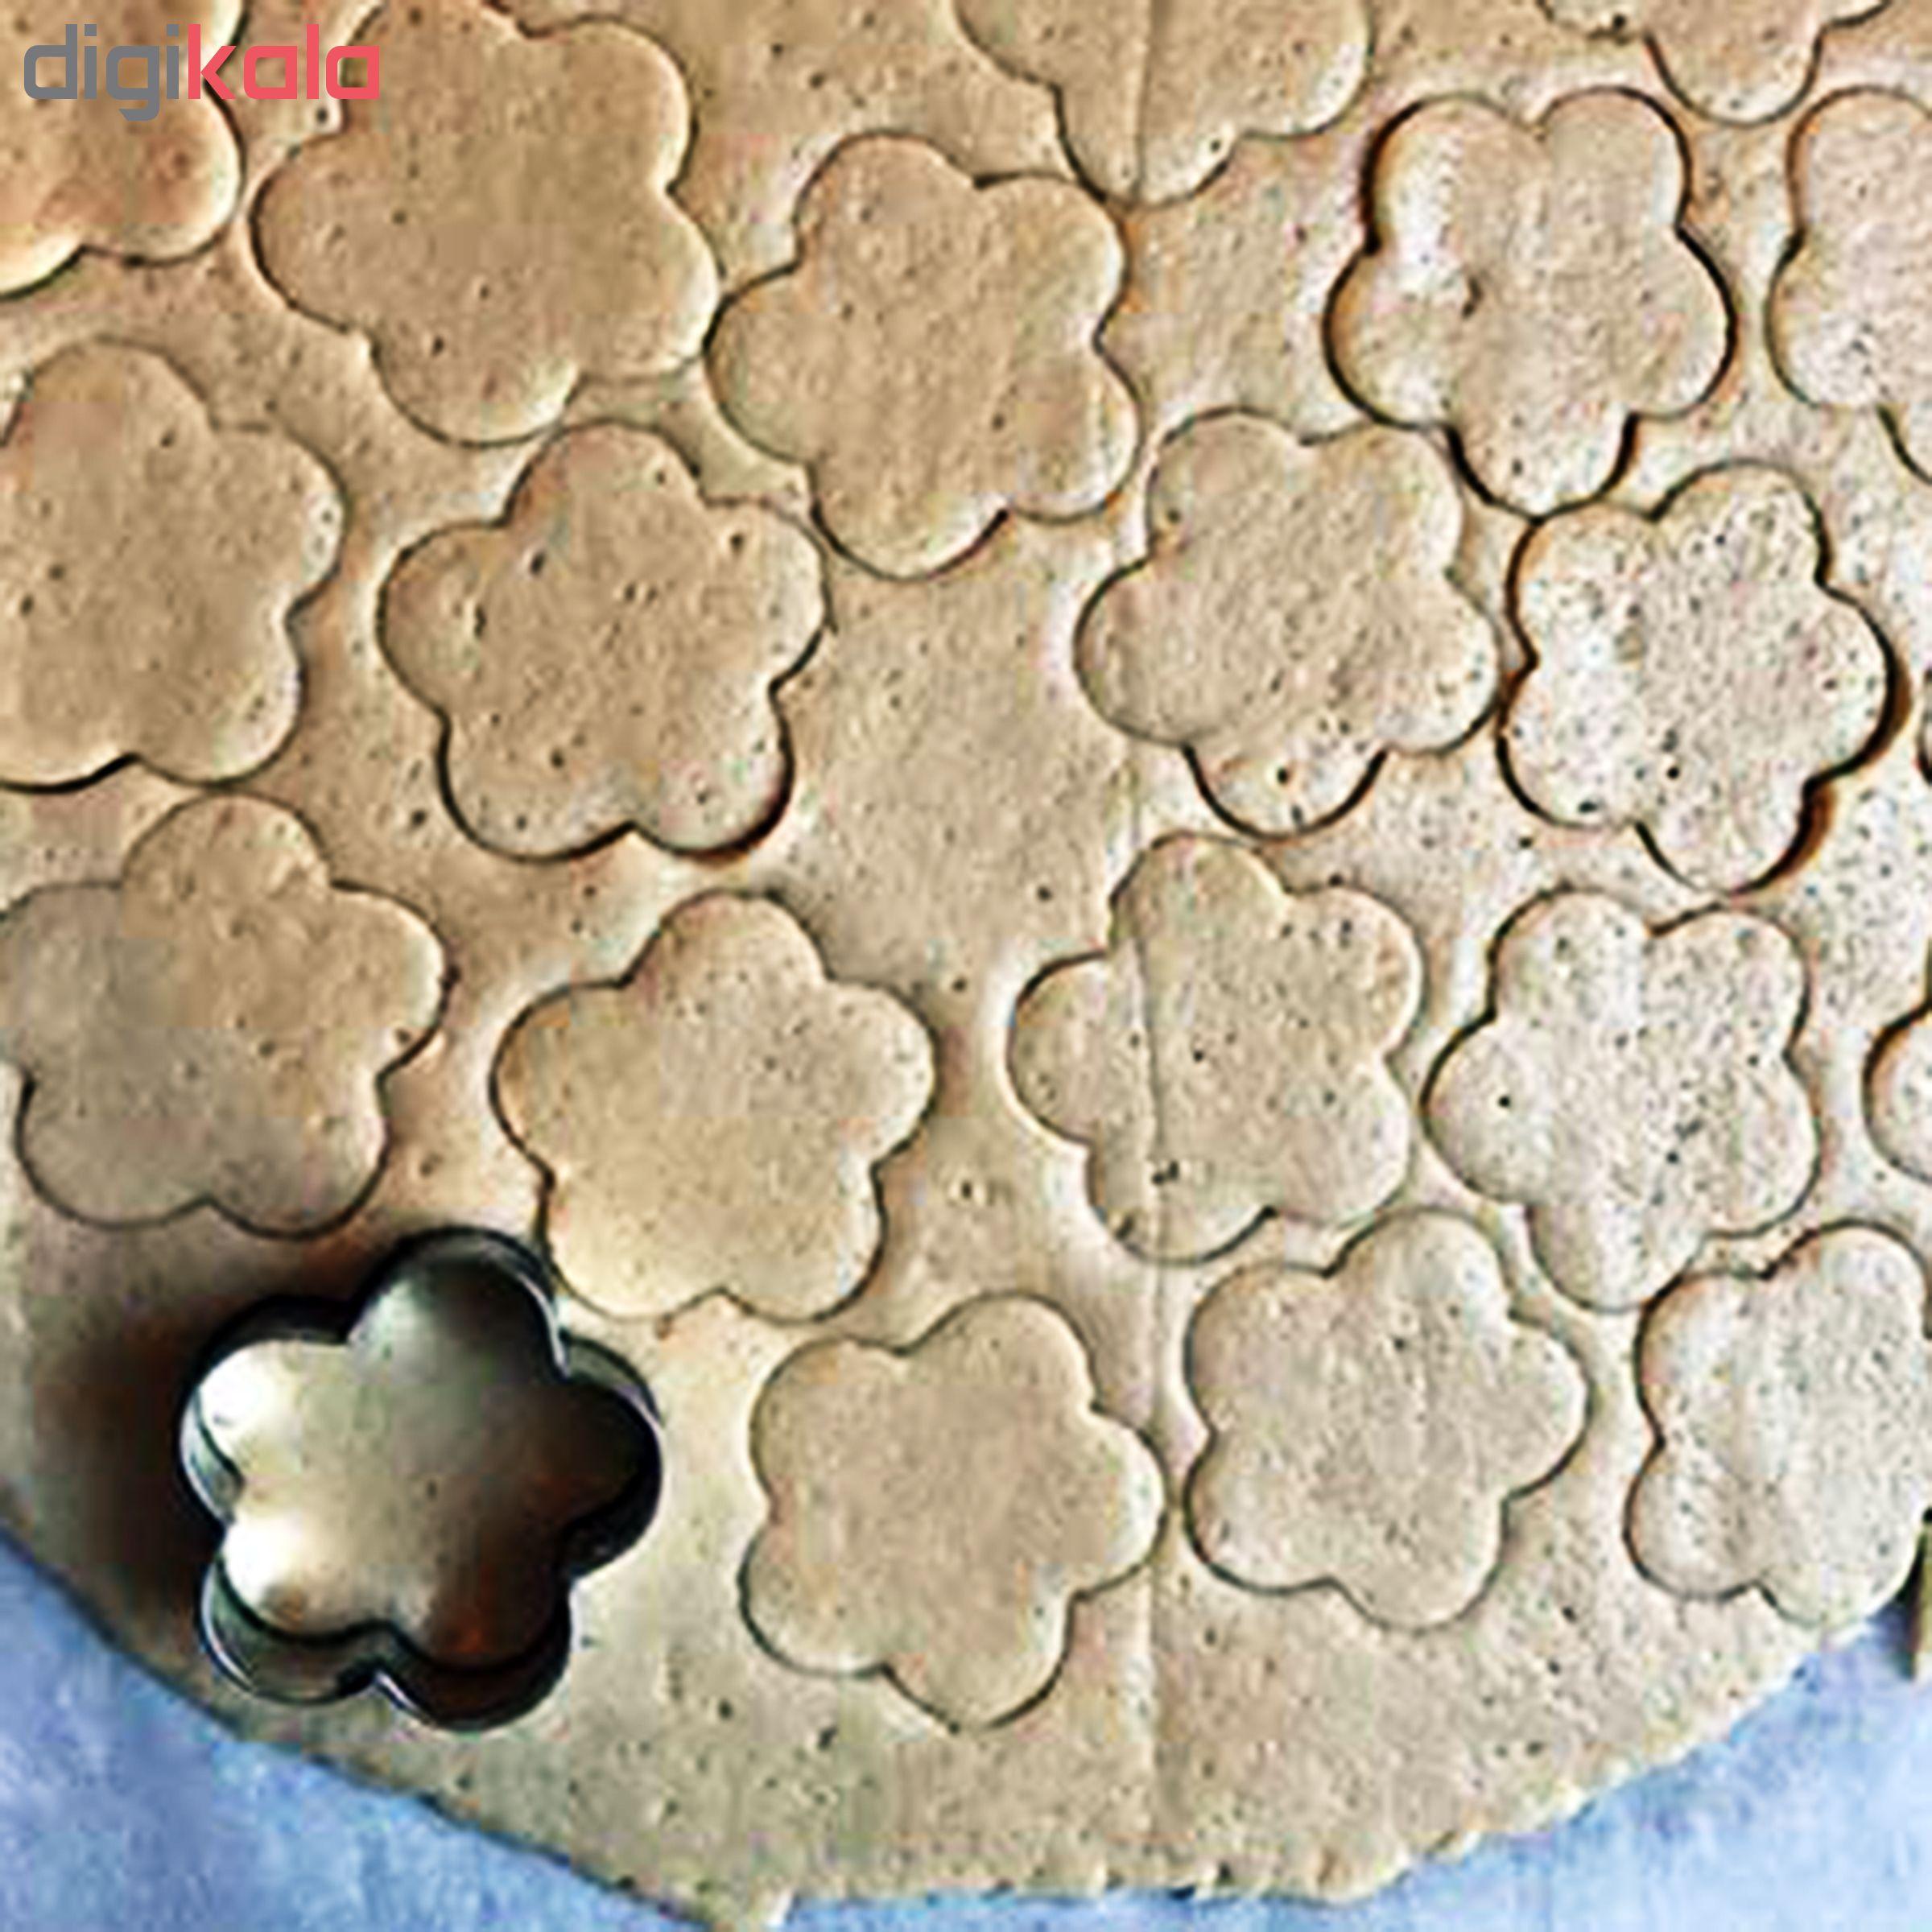 کاتر شیرینی پزی مدل Cookie Cutter بسته 12 عددی main 1 13